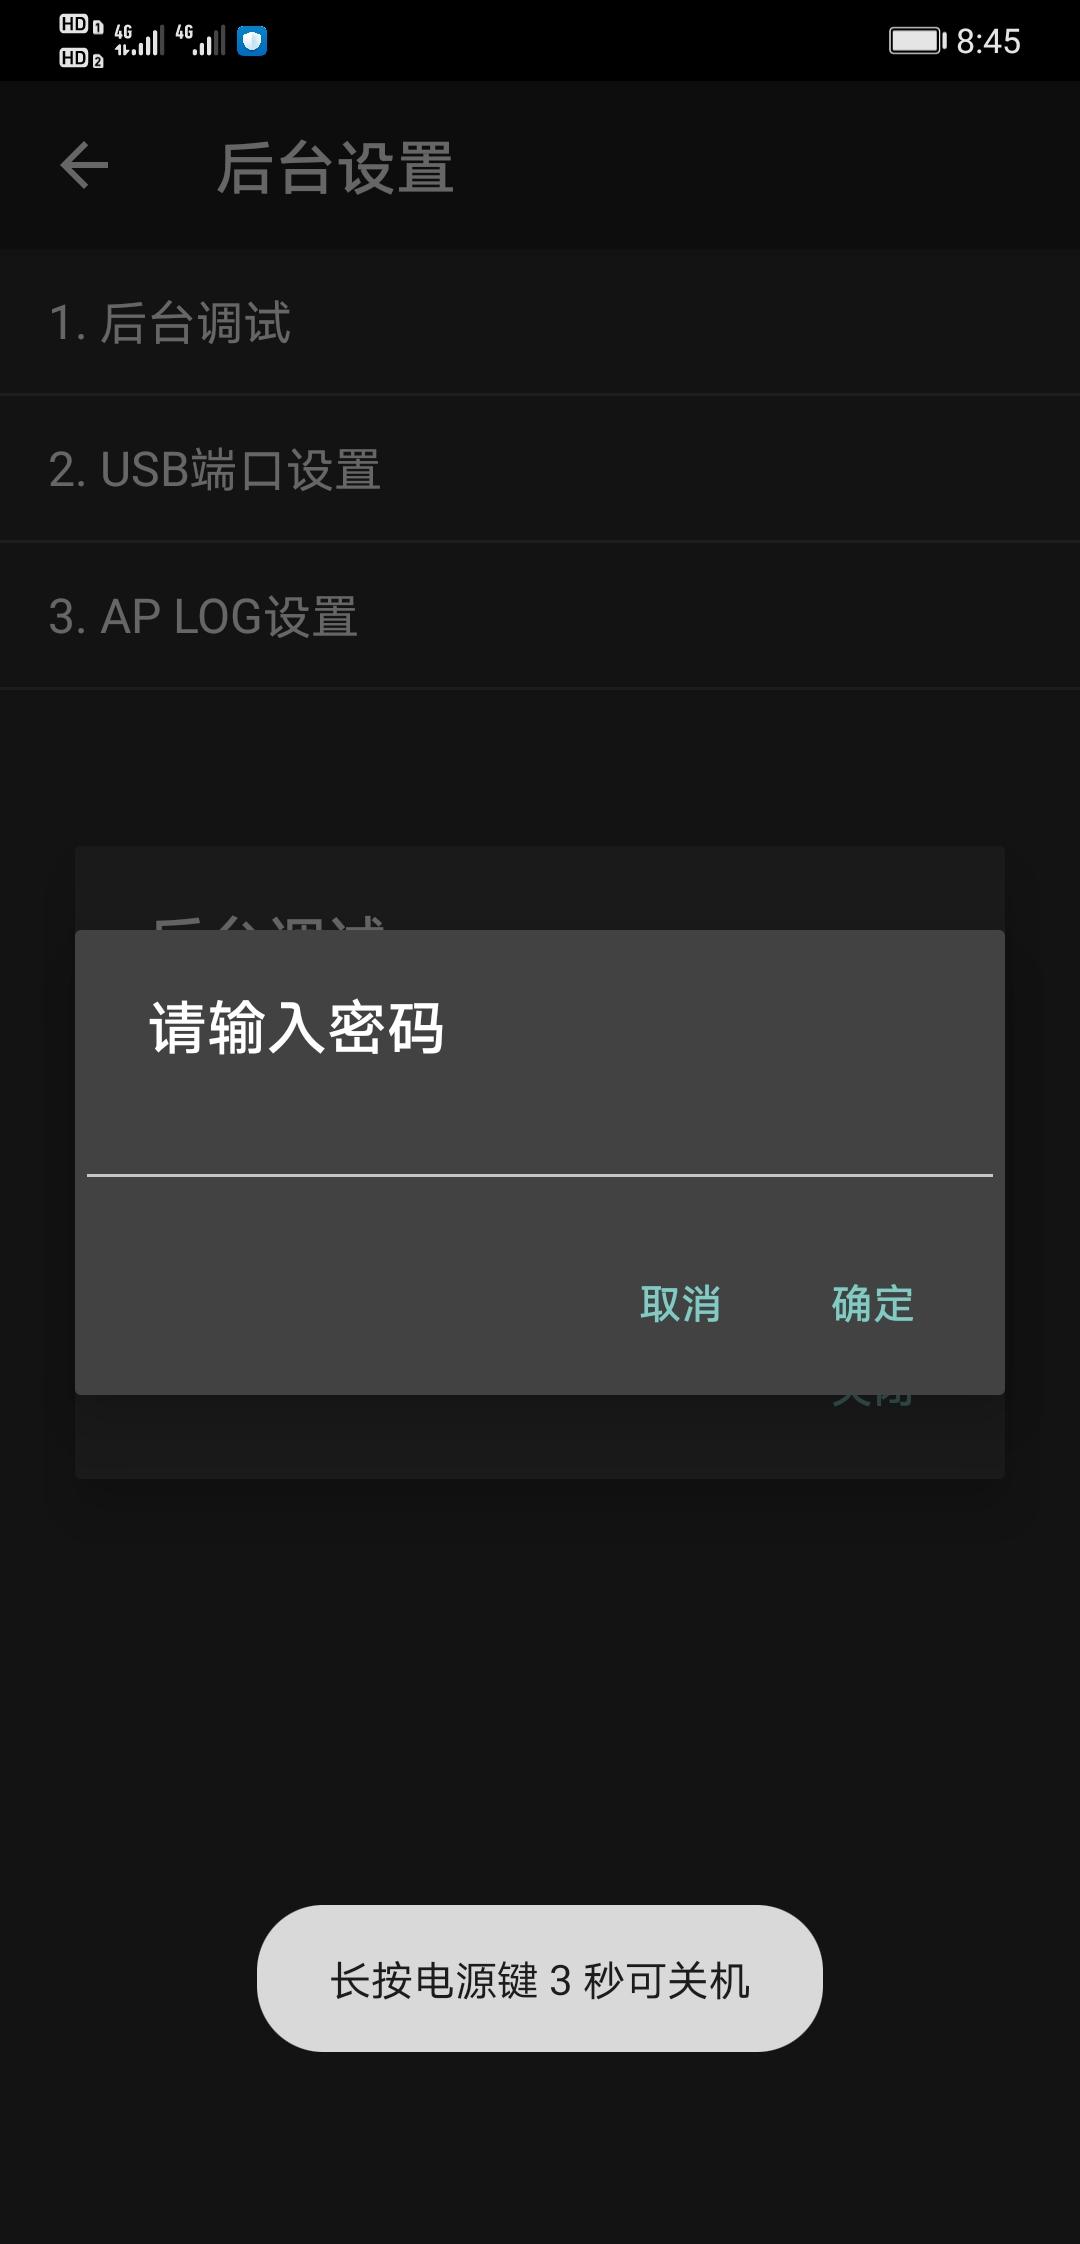 Screenshot_20200516_084546_com.huawei.android.projectmenu.jpg